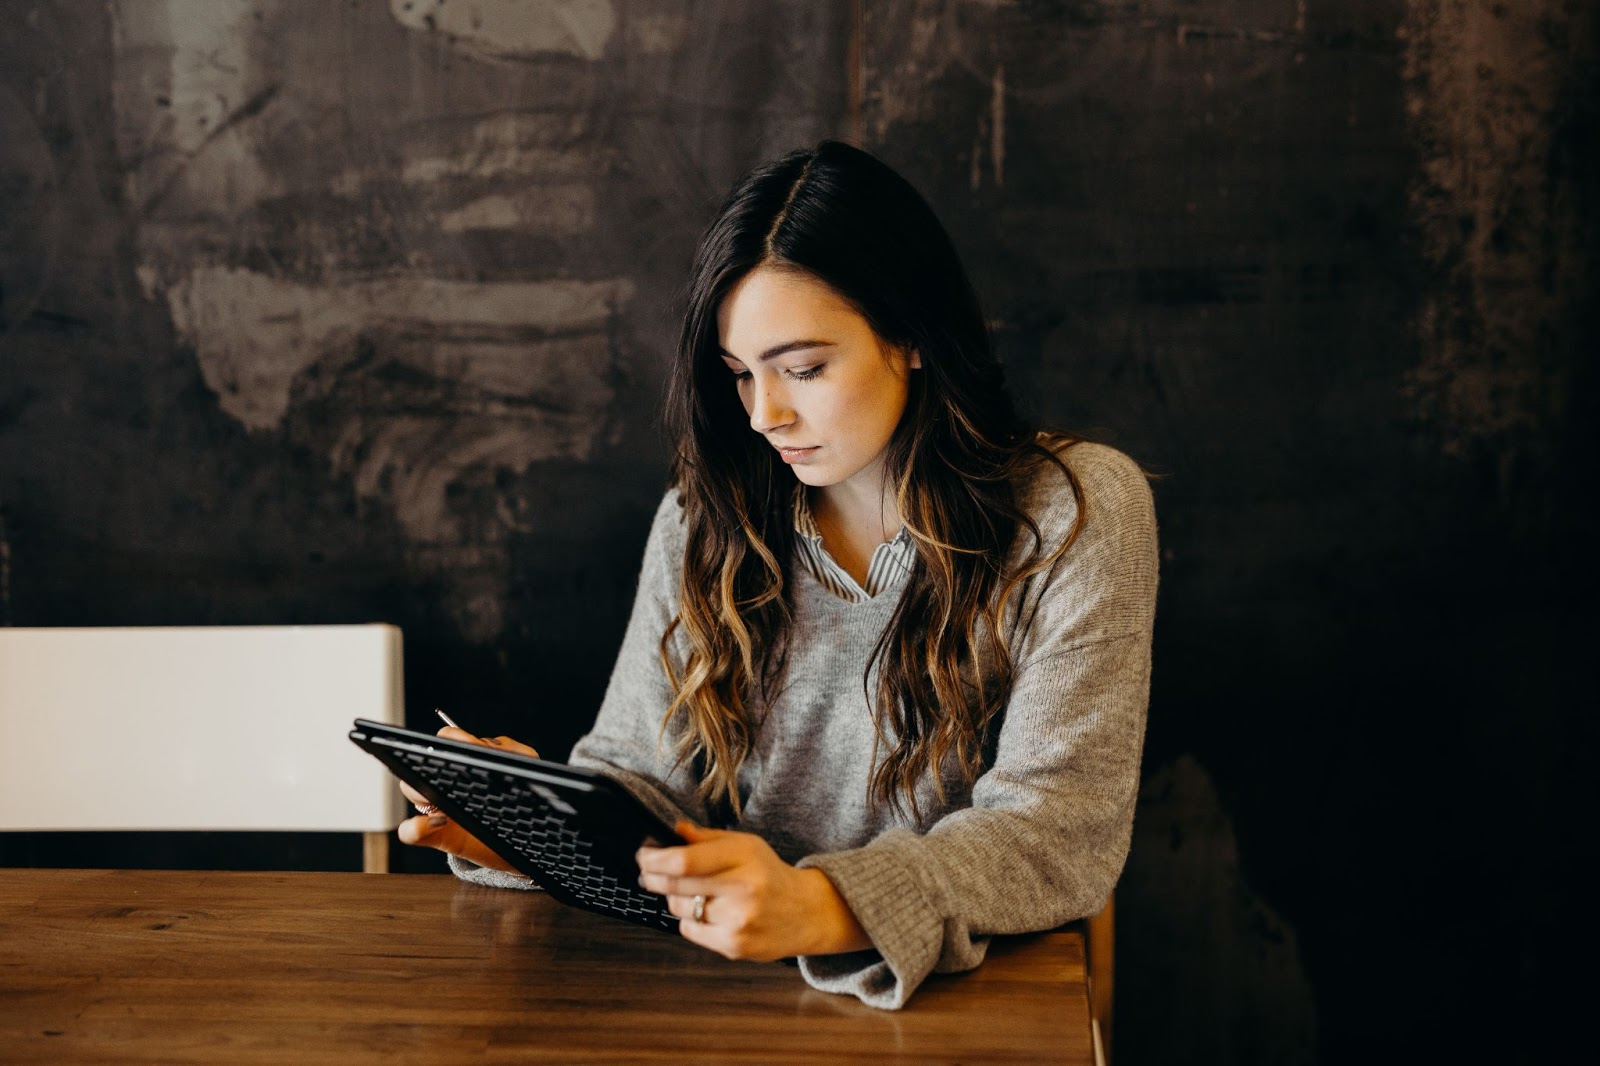 Research job salaries